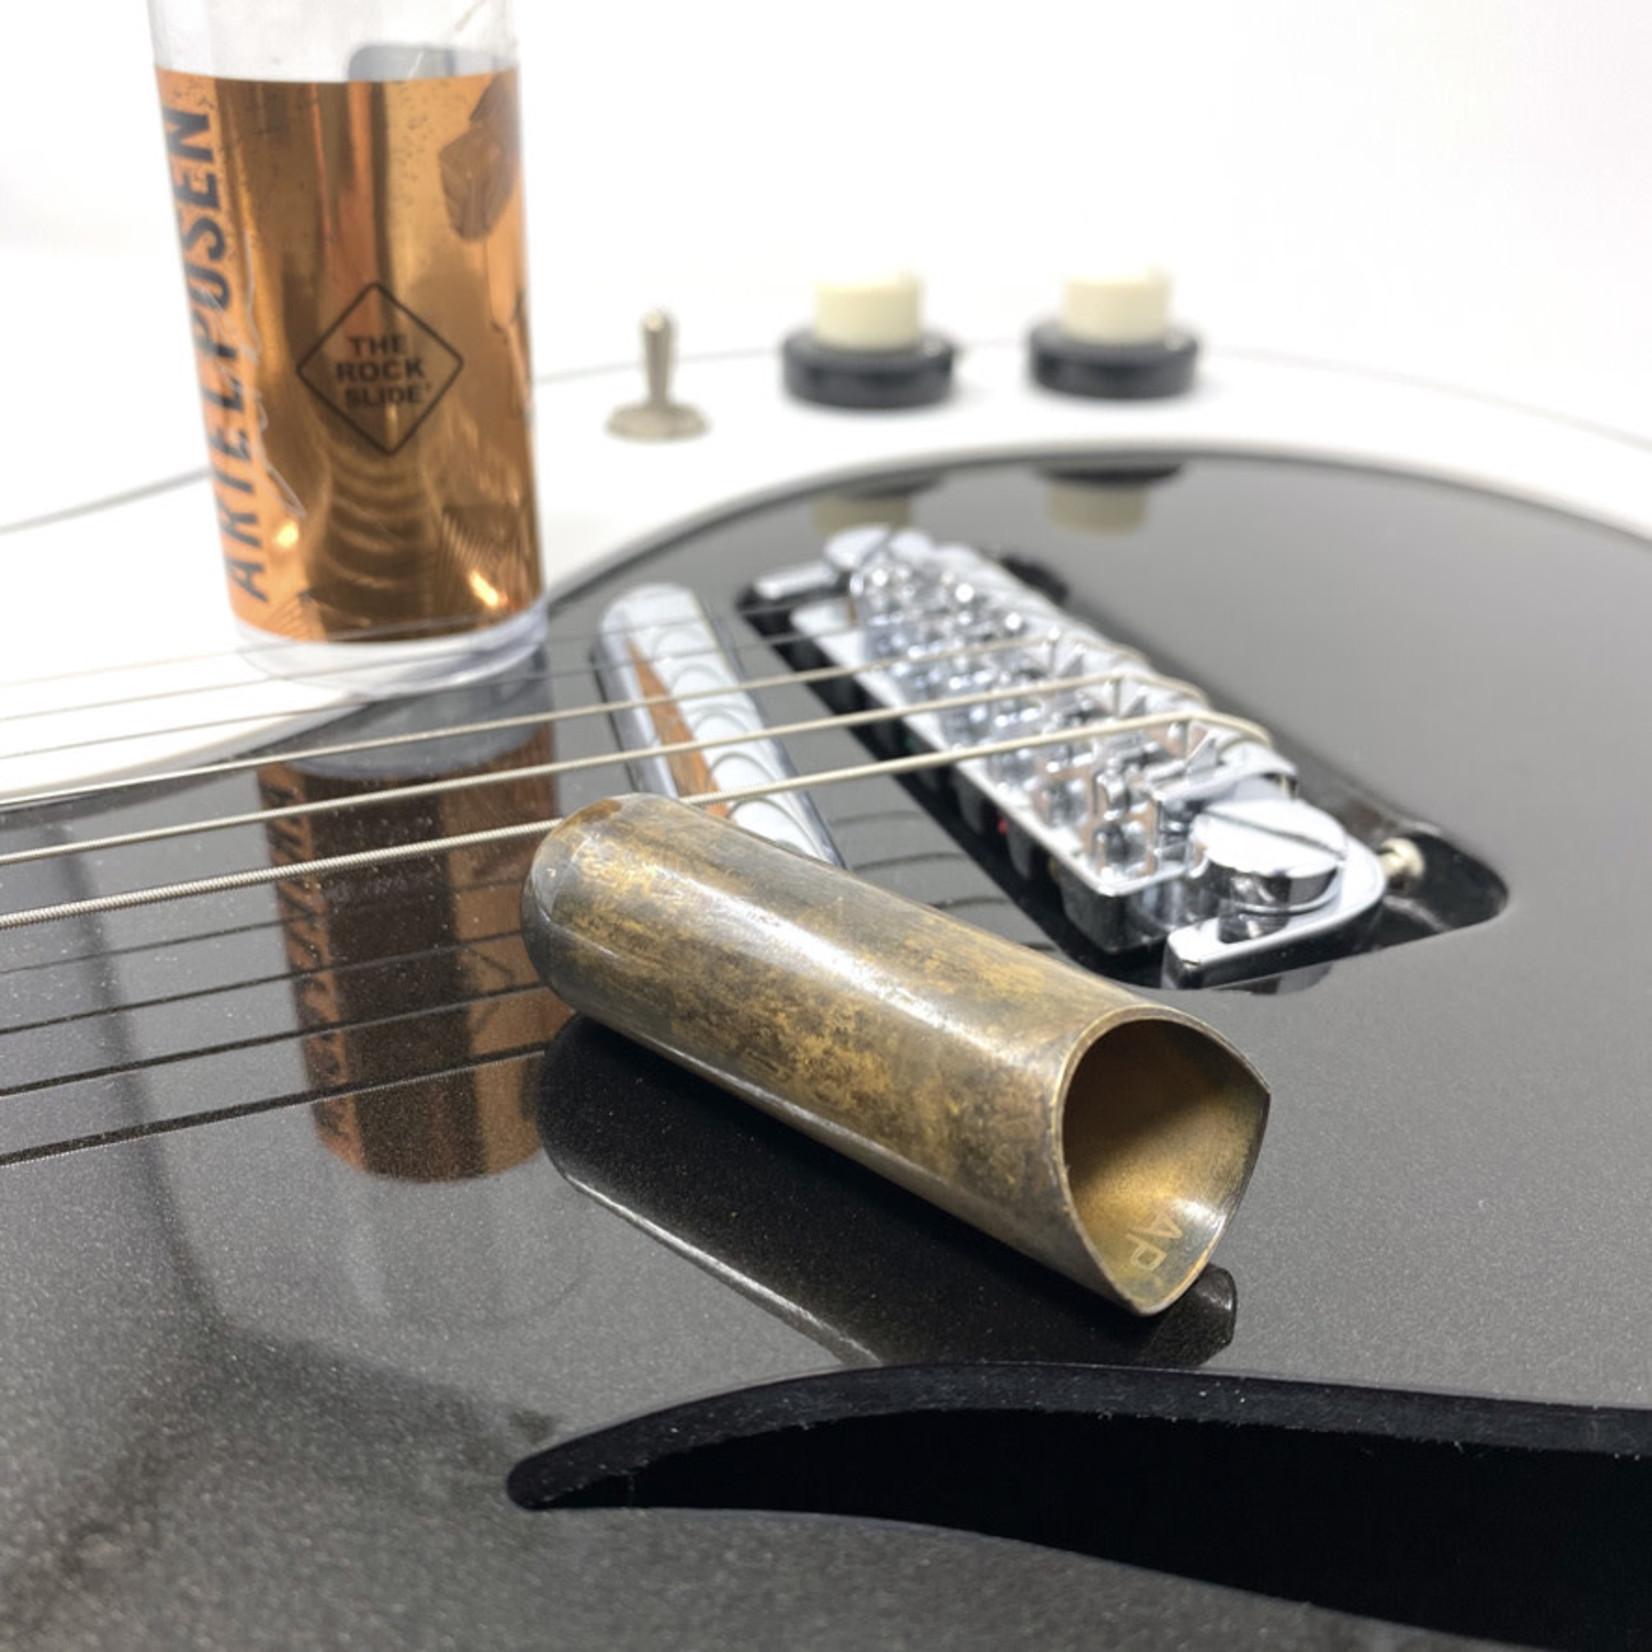 The Rock Slide The Rock Slide - Ariel Posen Signature Slide - AGED Brass